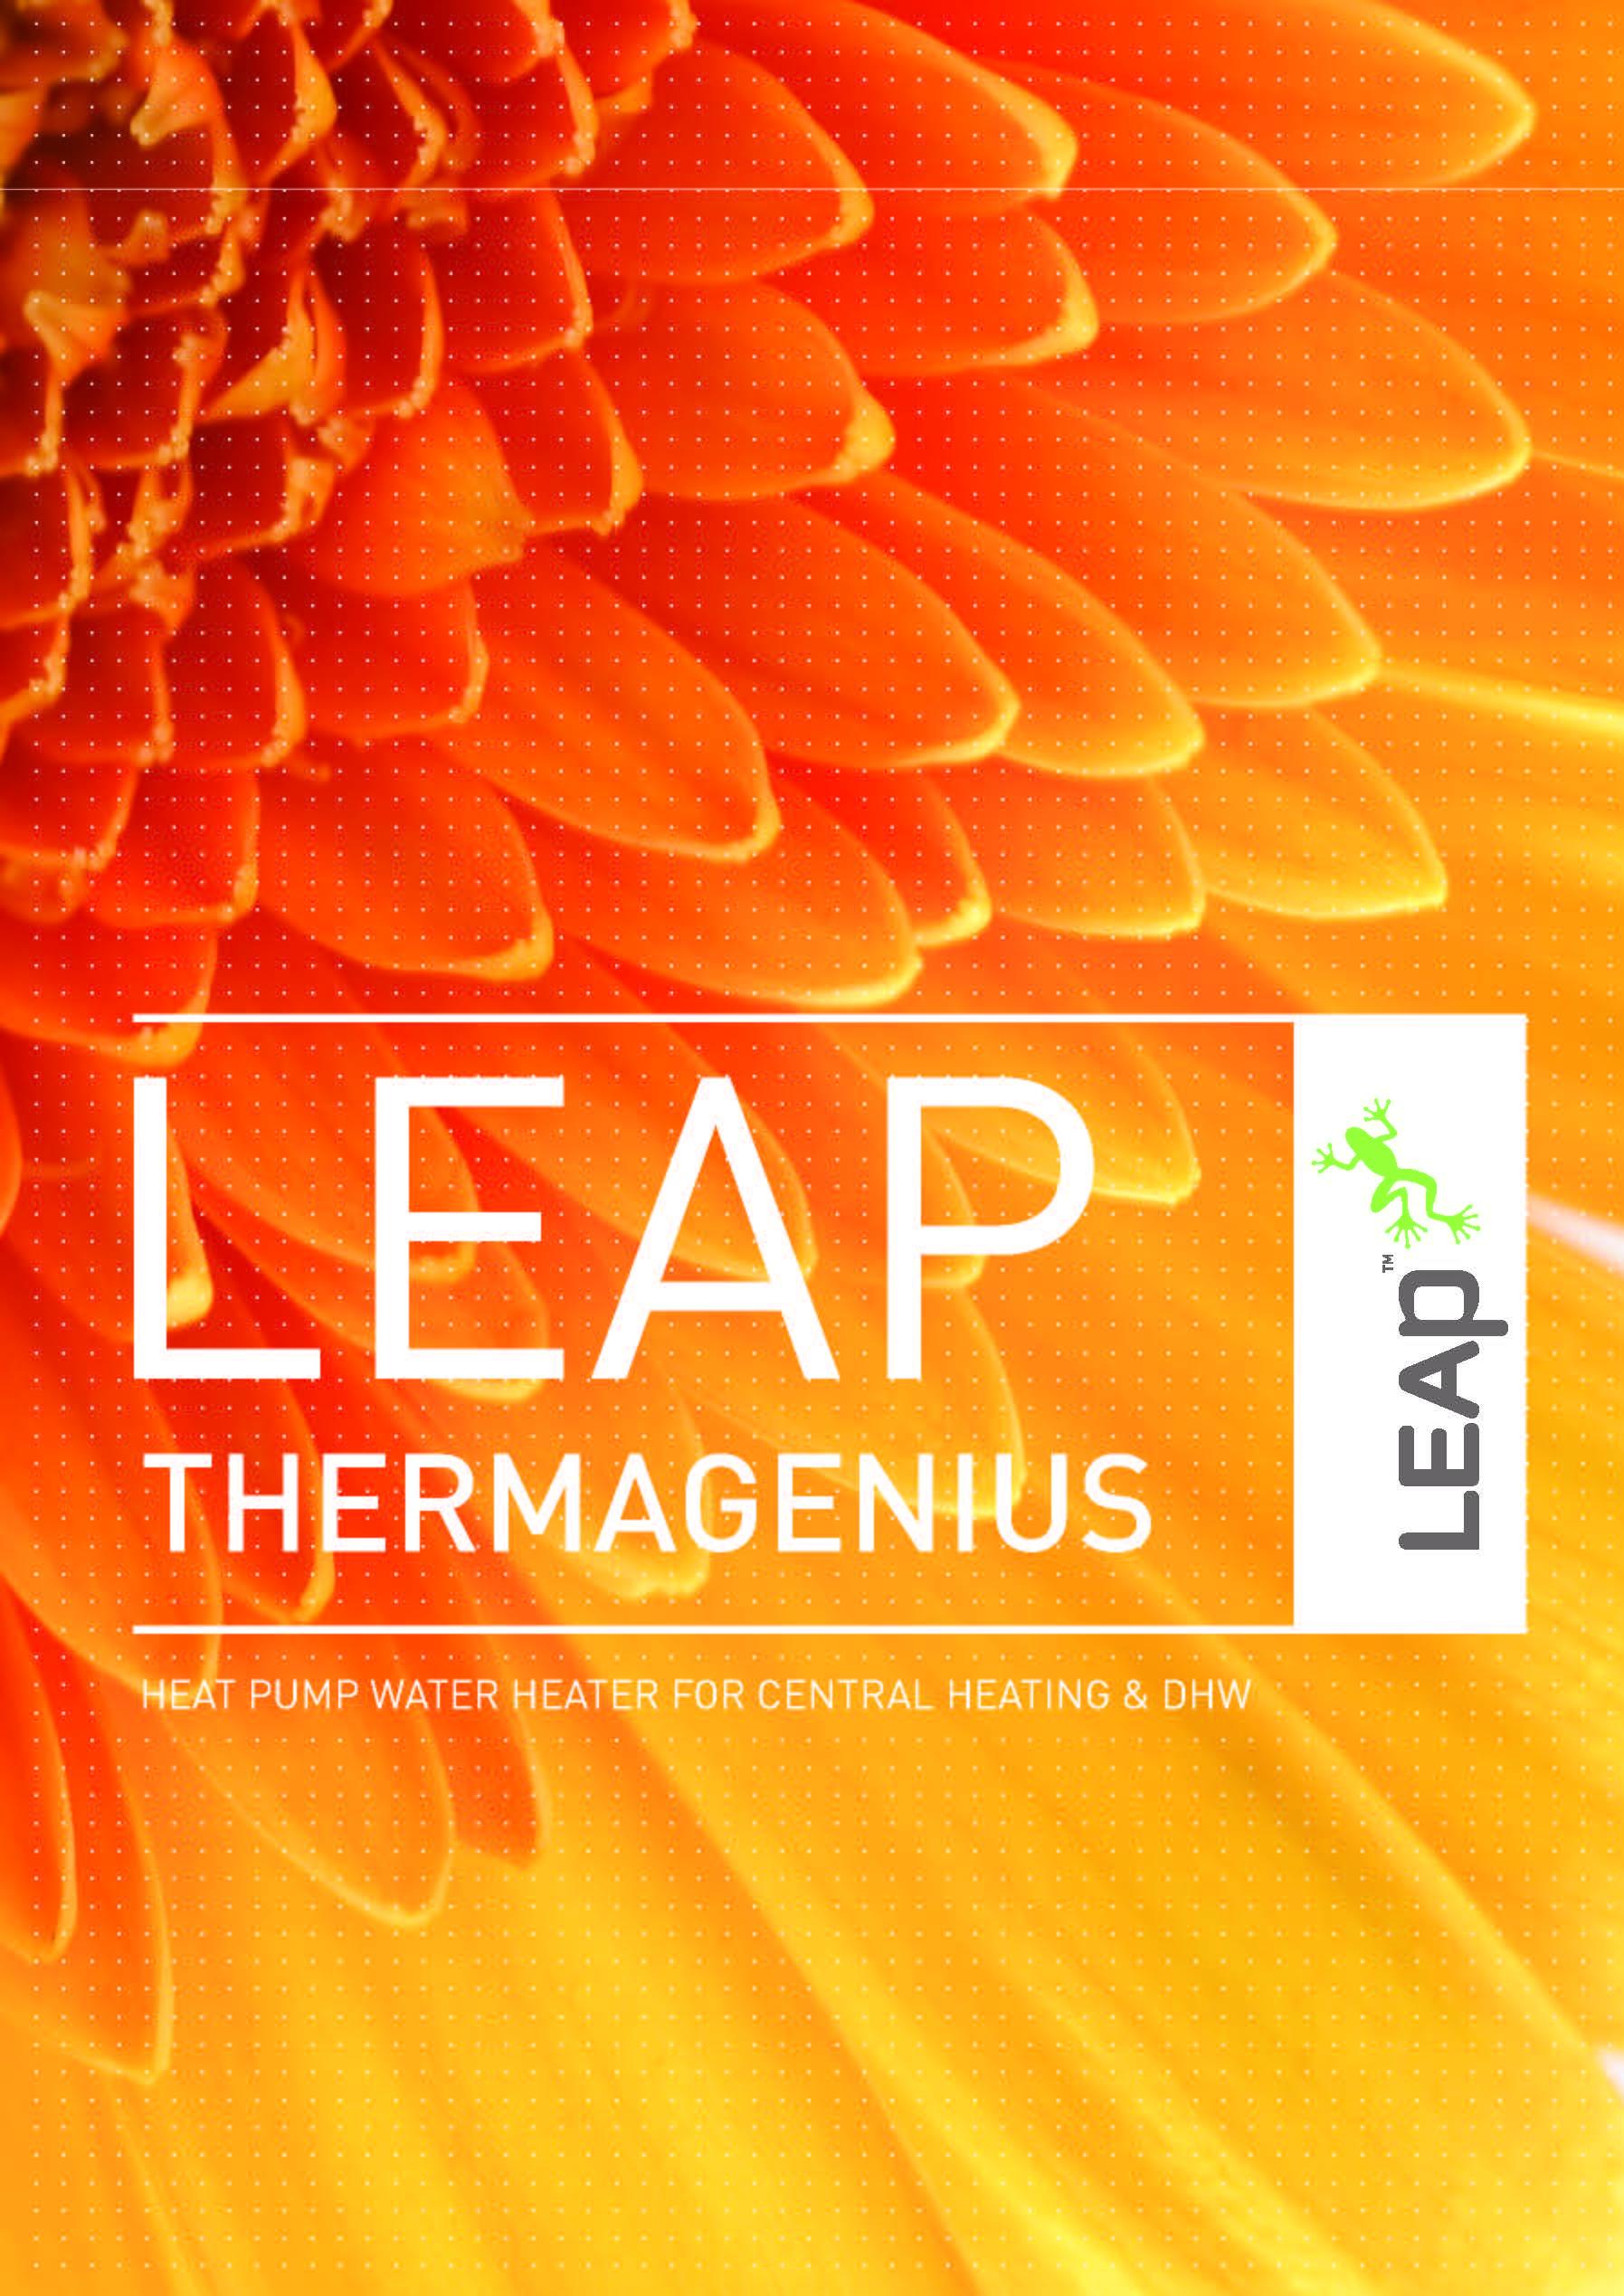 LEAP_THERMAGENIUS HPWH 25C078 Hdr.jpg